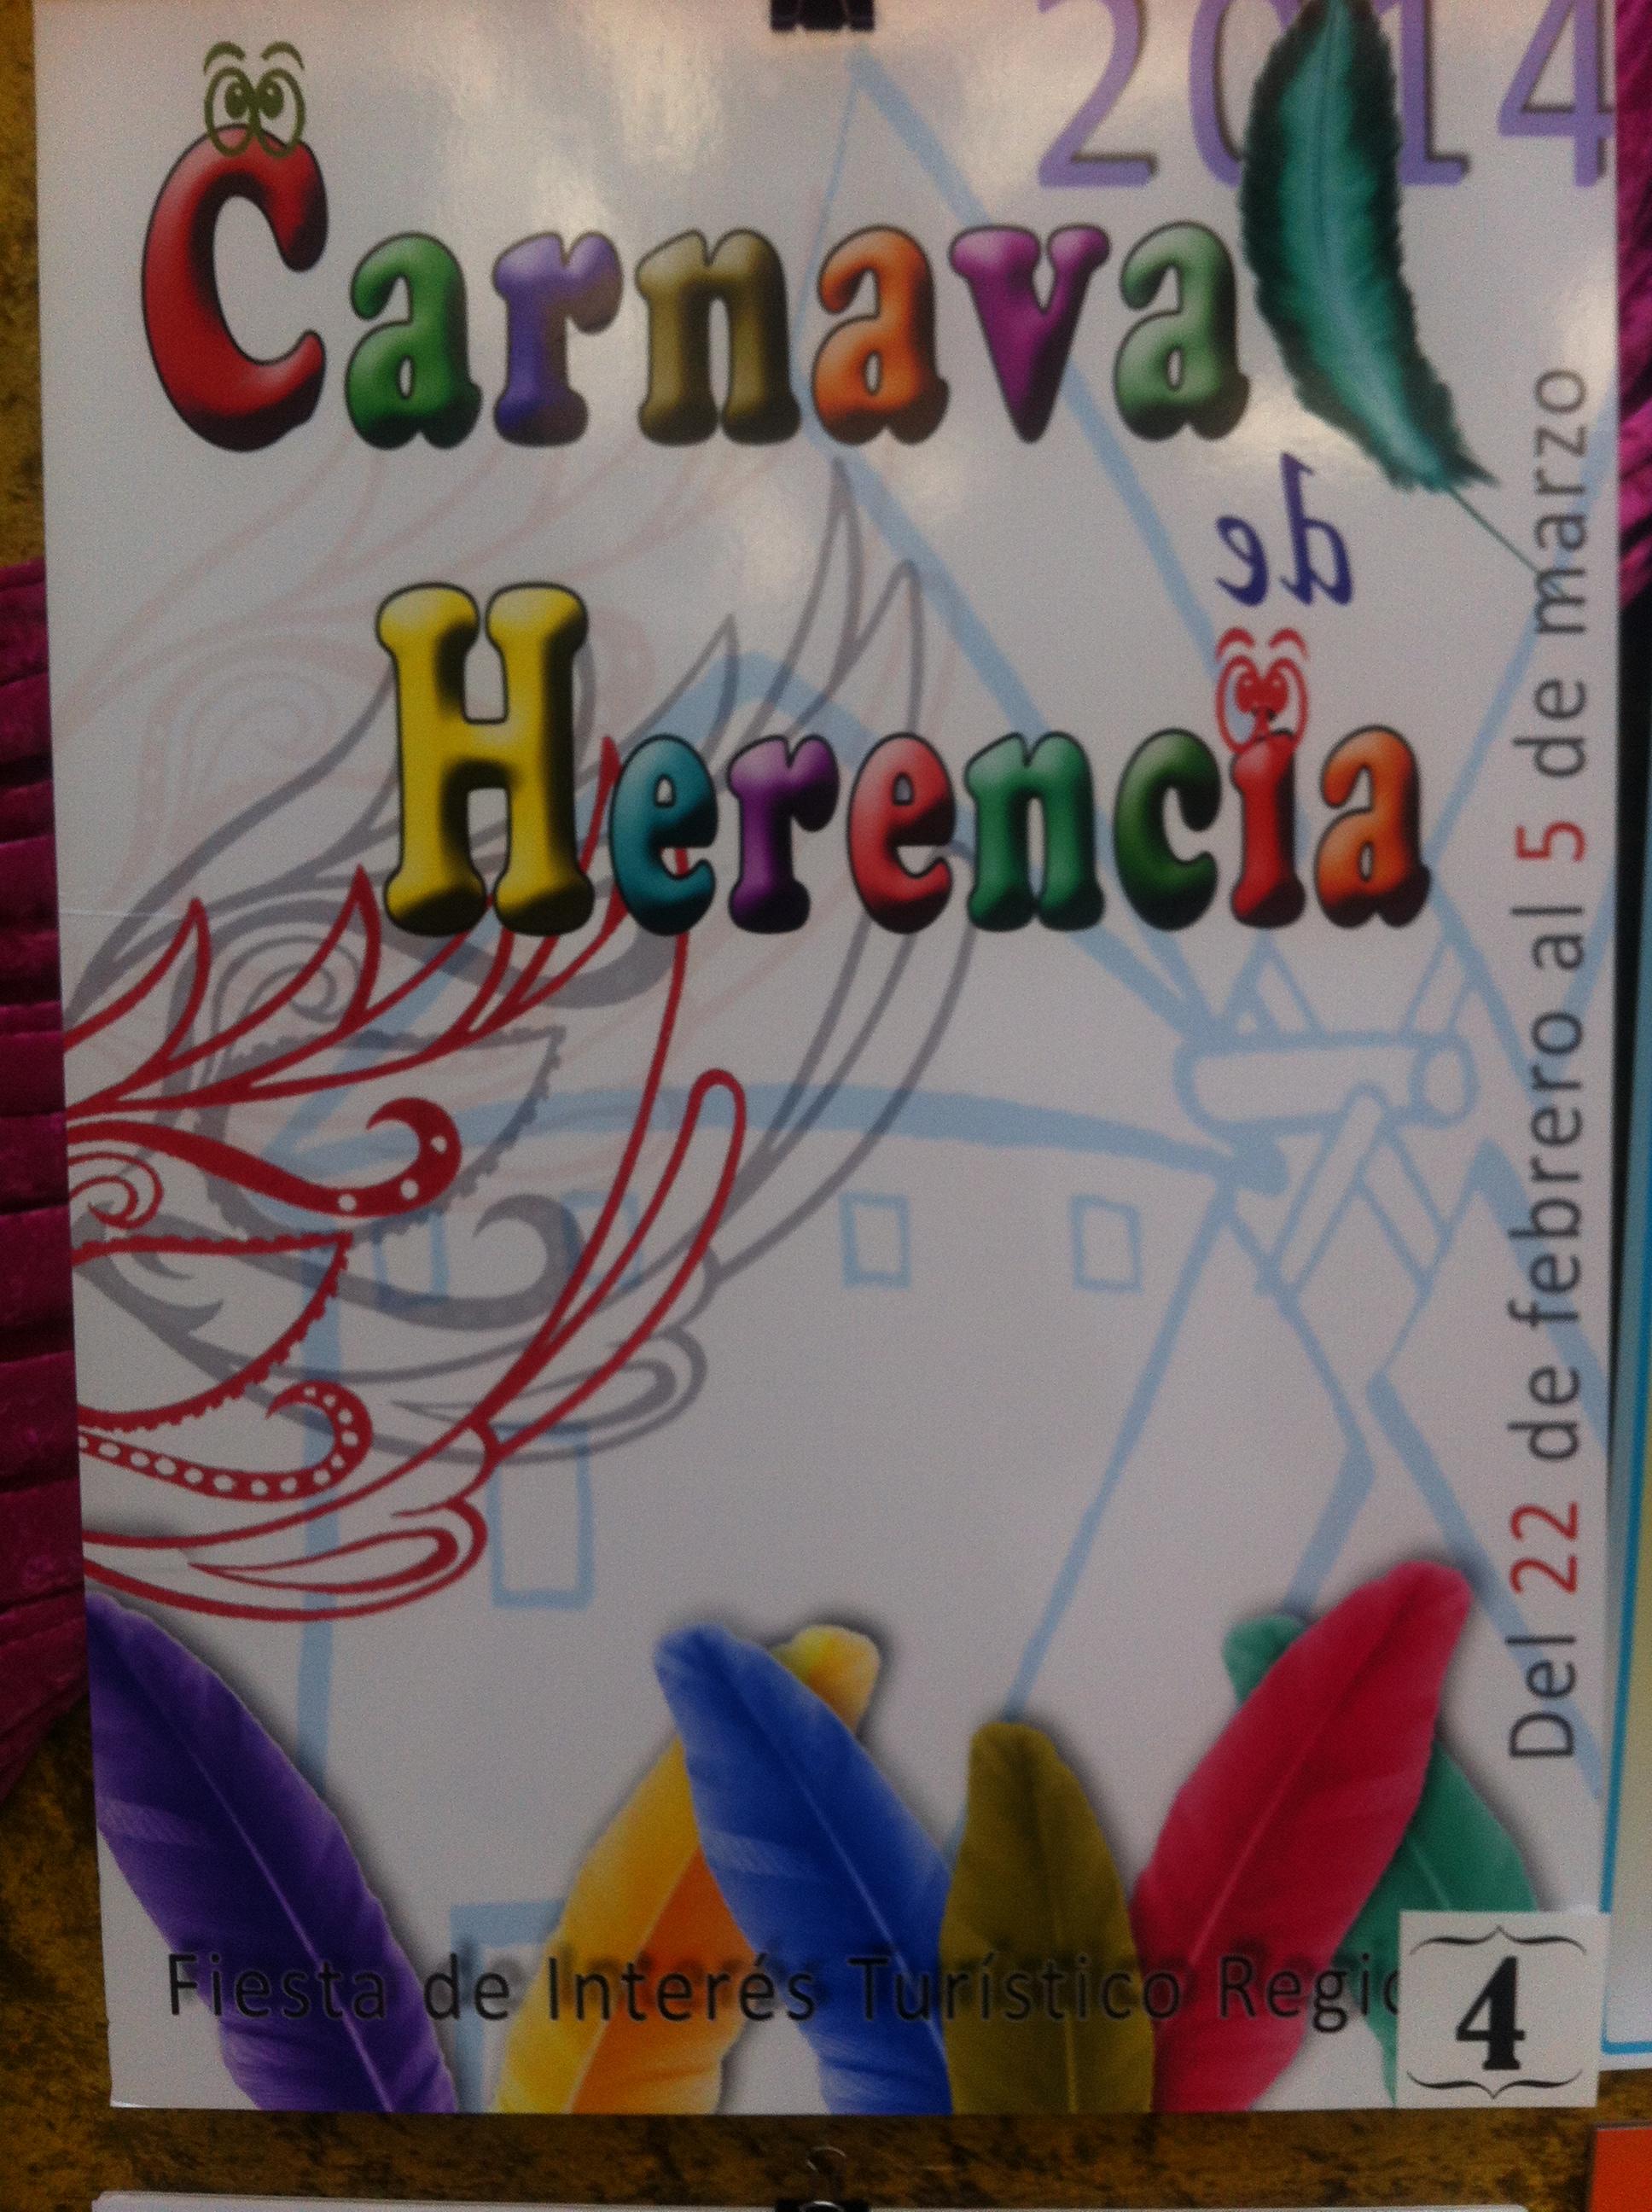 Concurso Carteles Carnaval 2014 (4)